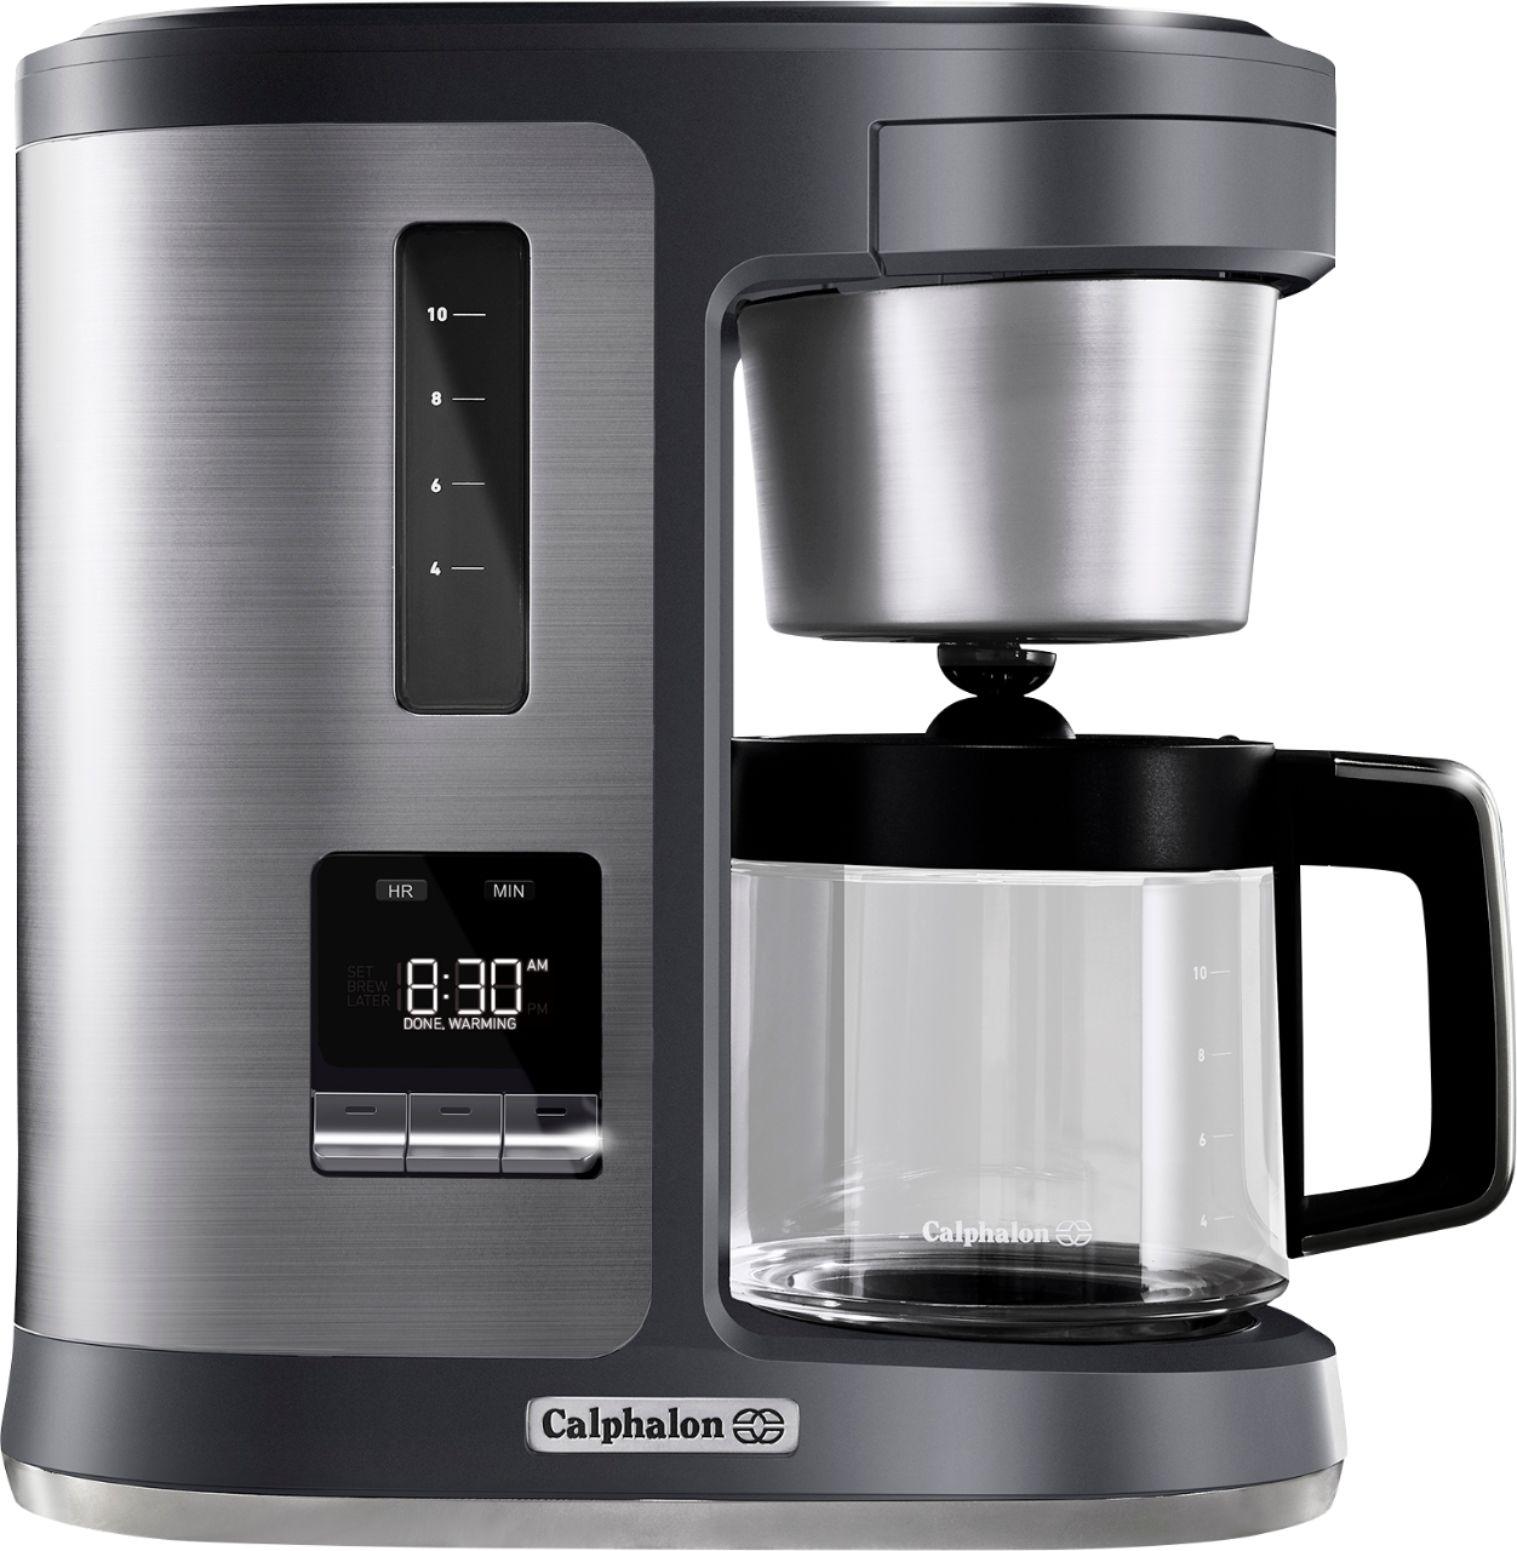 Calphalon Special Brew 10-Cup Coffee Maker Dark Stainless Steel BVCLDCG1 - Best Buy $40